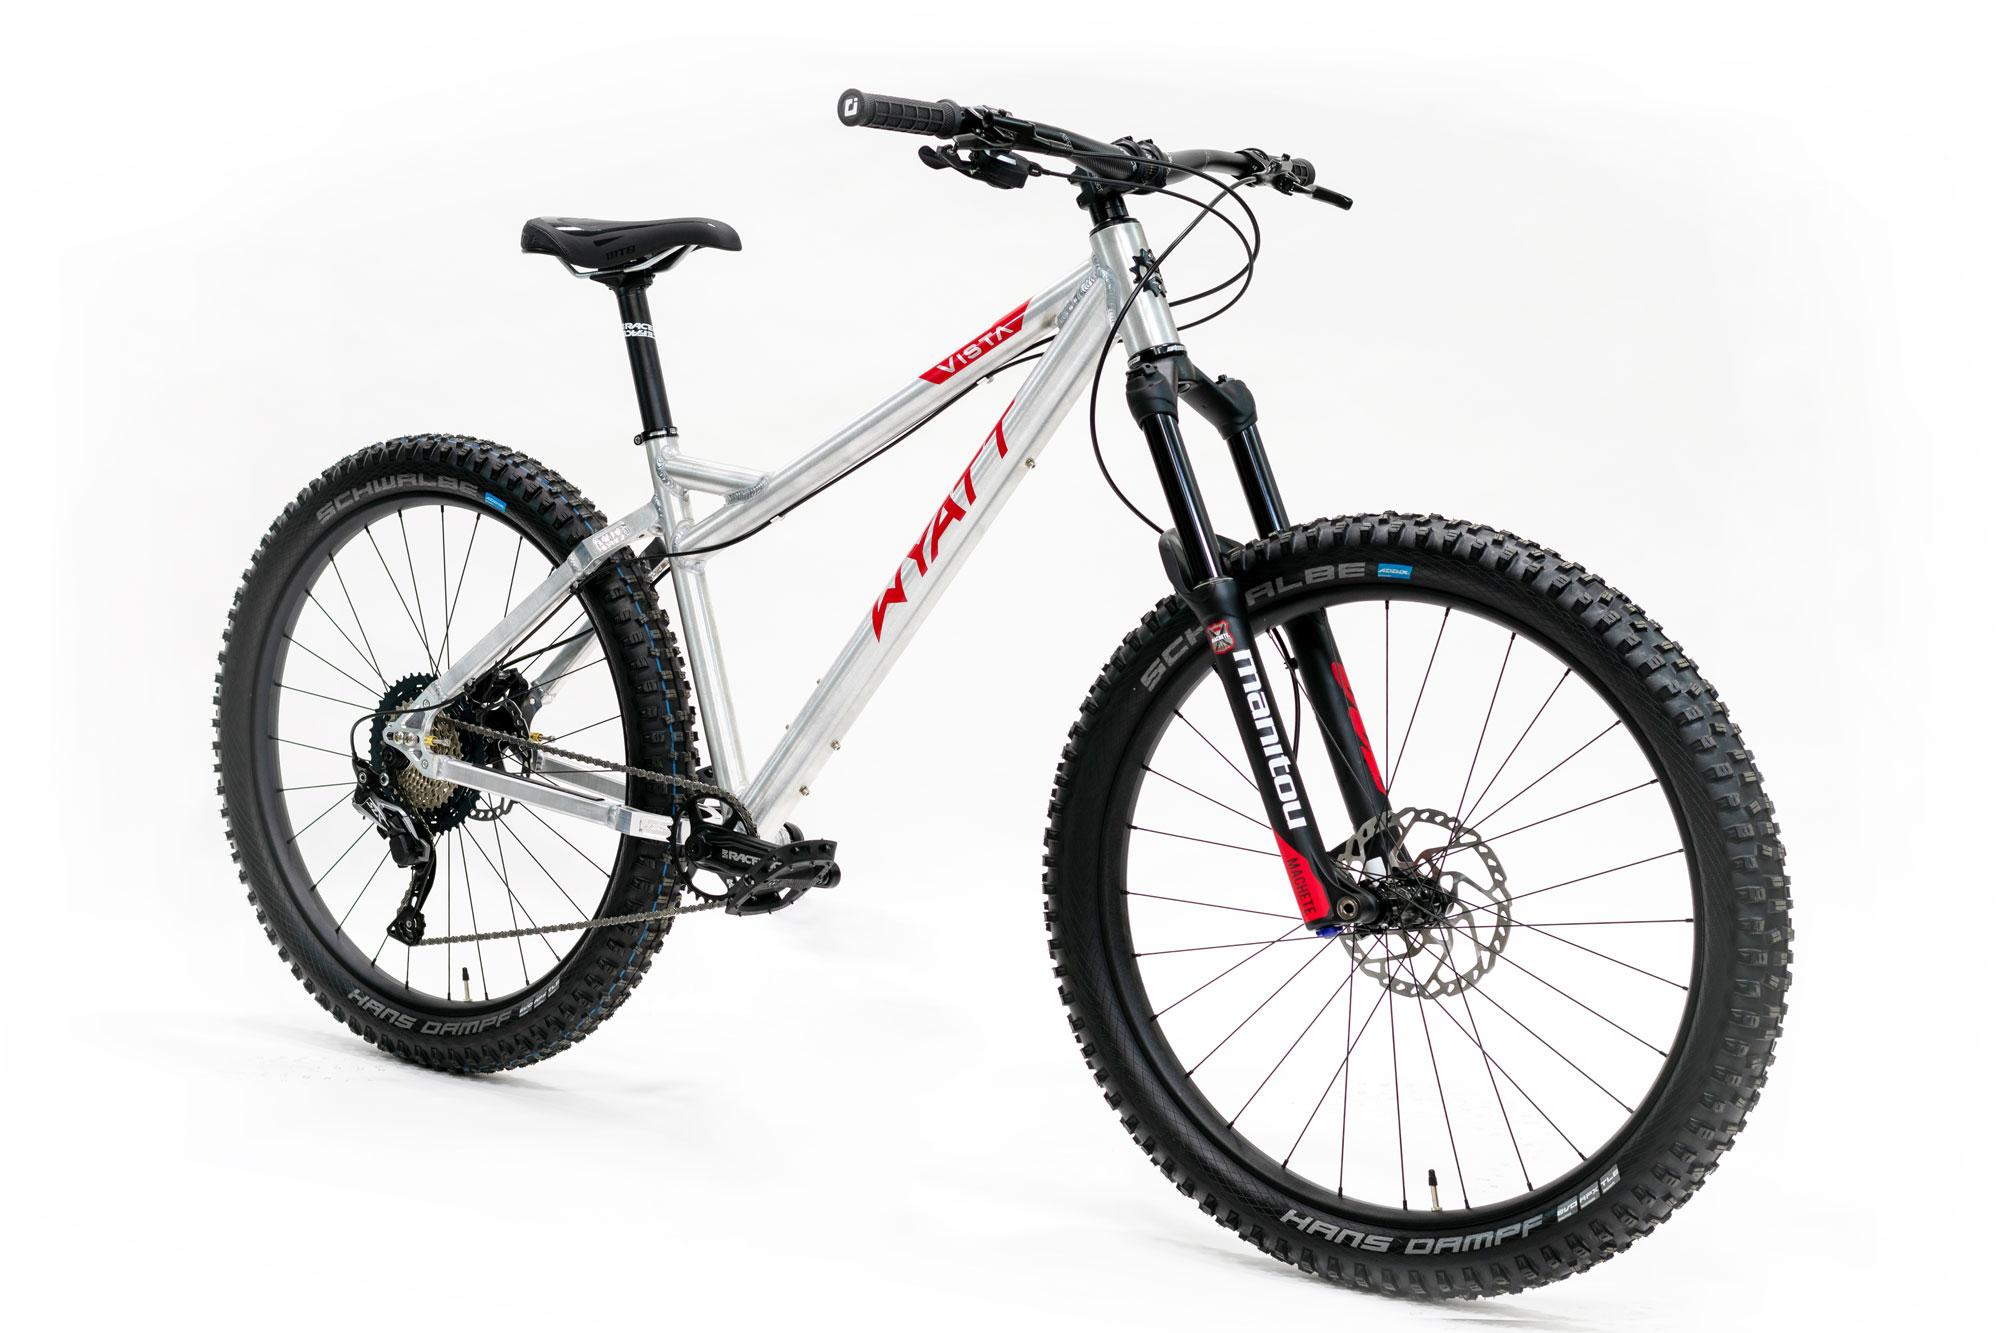 American-made mountain bike